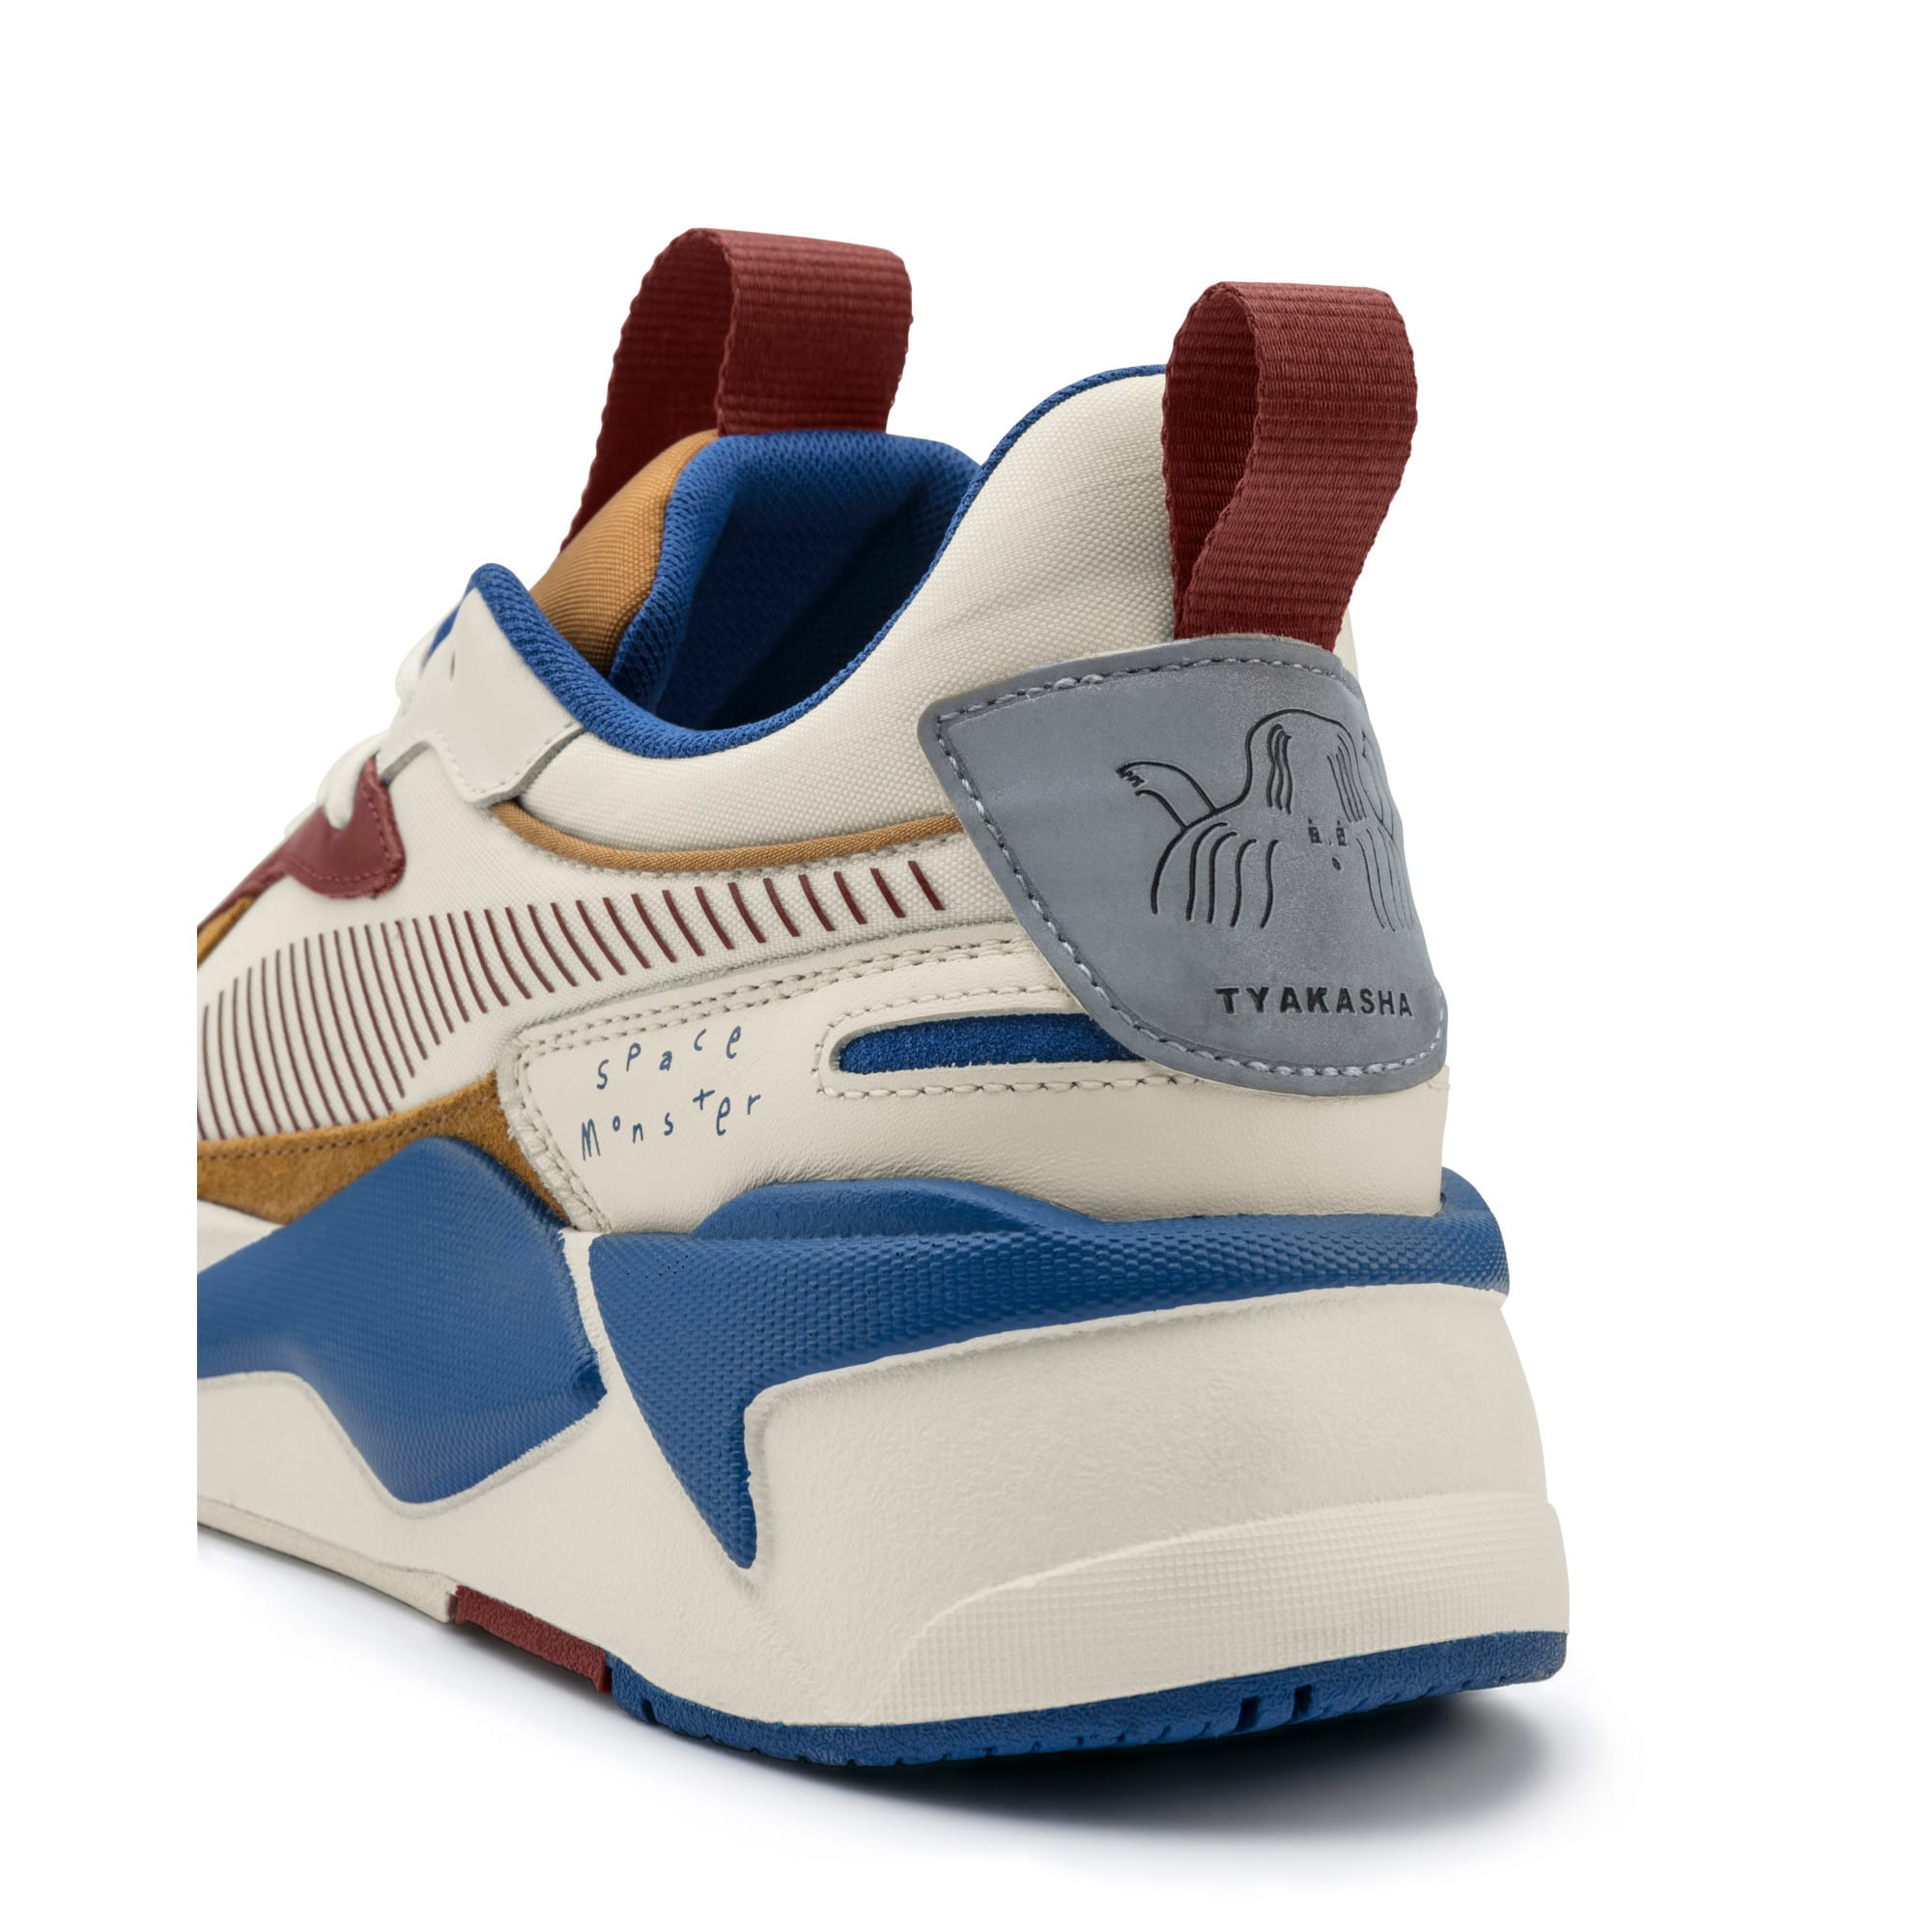 Thumbnail 11 of PUMA x TYAKASHA RS-X Sneakers, Whisper White-Fired Brick, medium